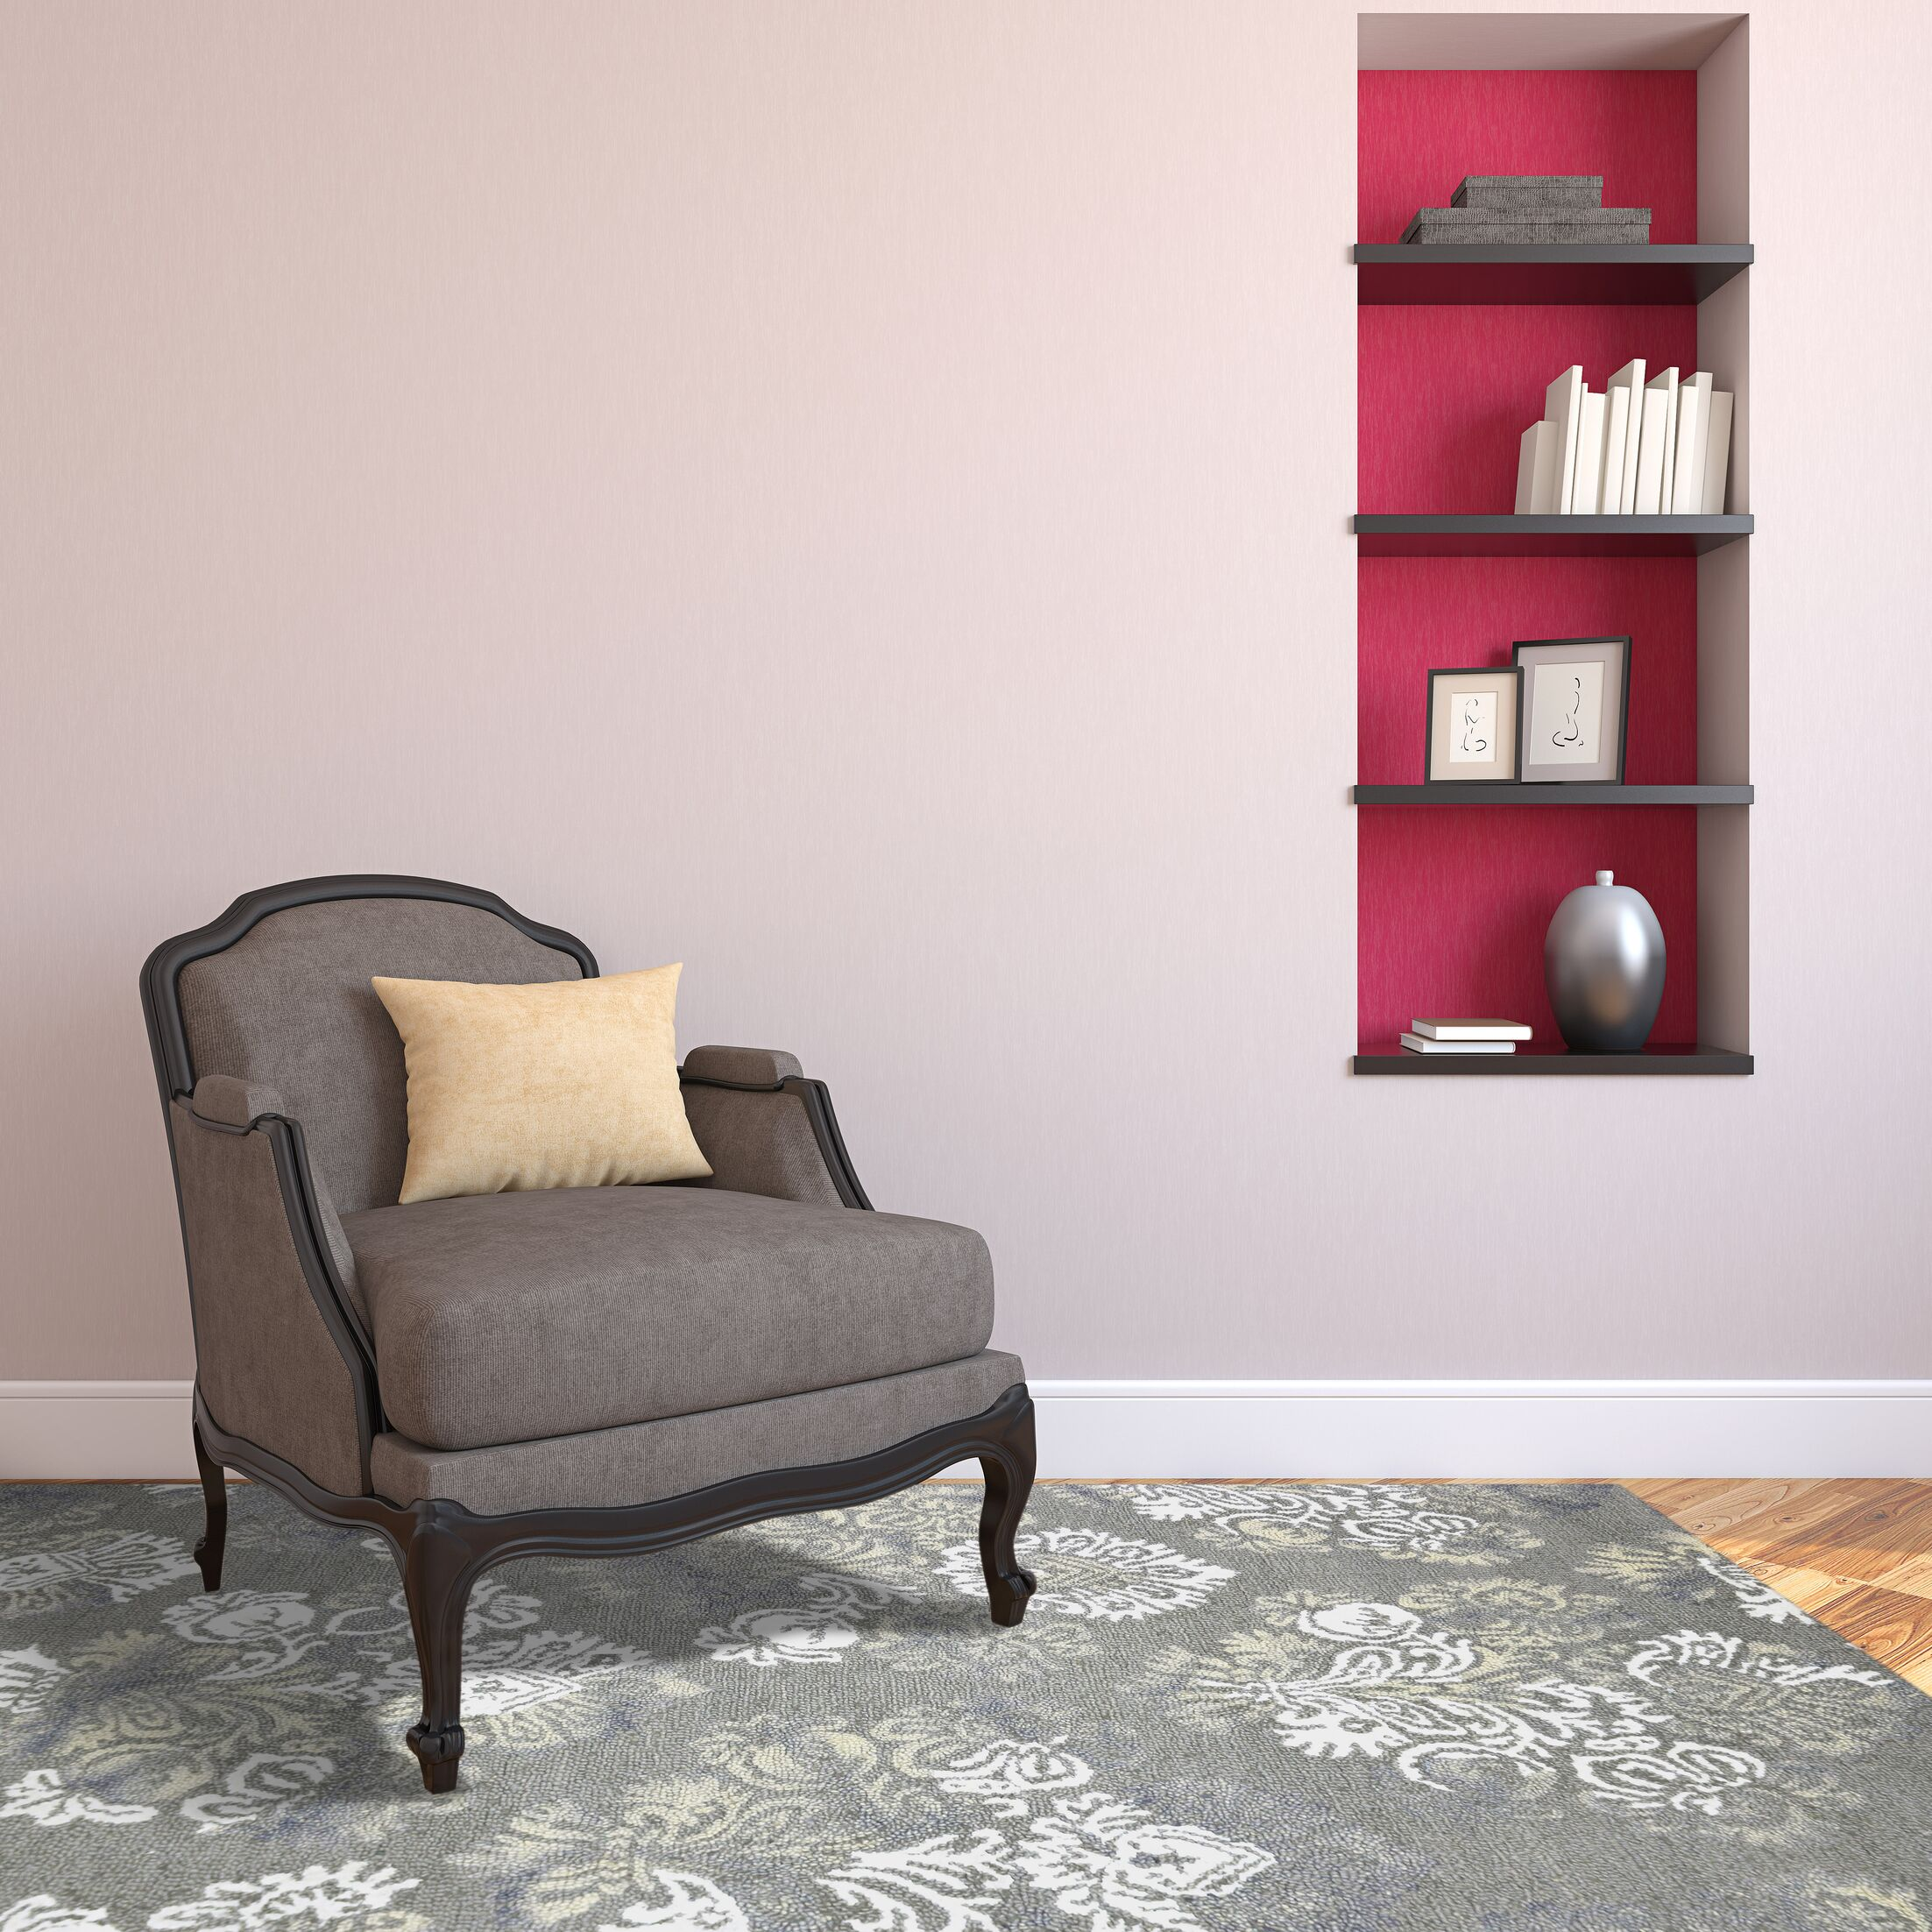 Averi Hand-Tufted Handmade Silver Area Rug Rug Size: 5' x 8'